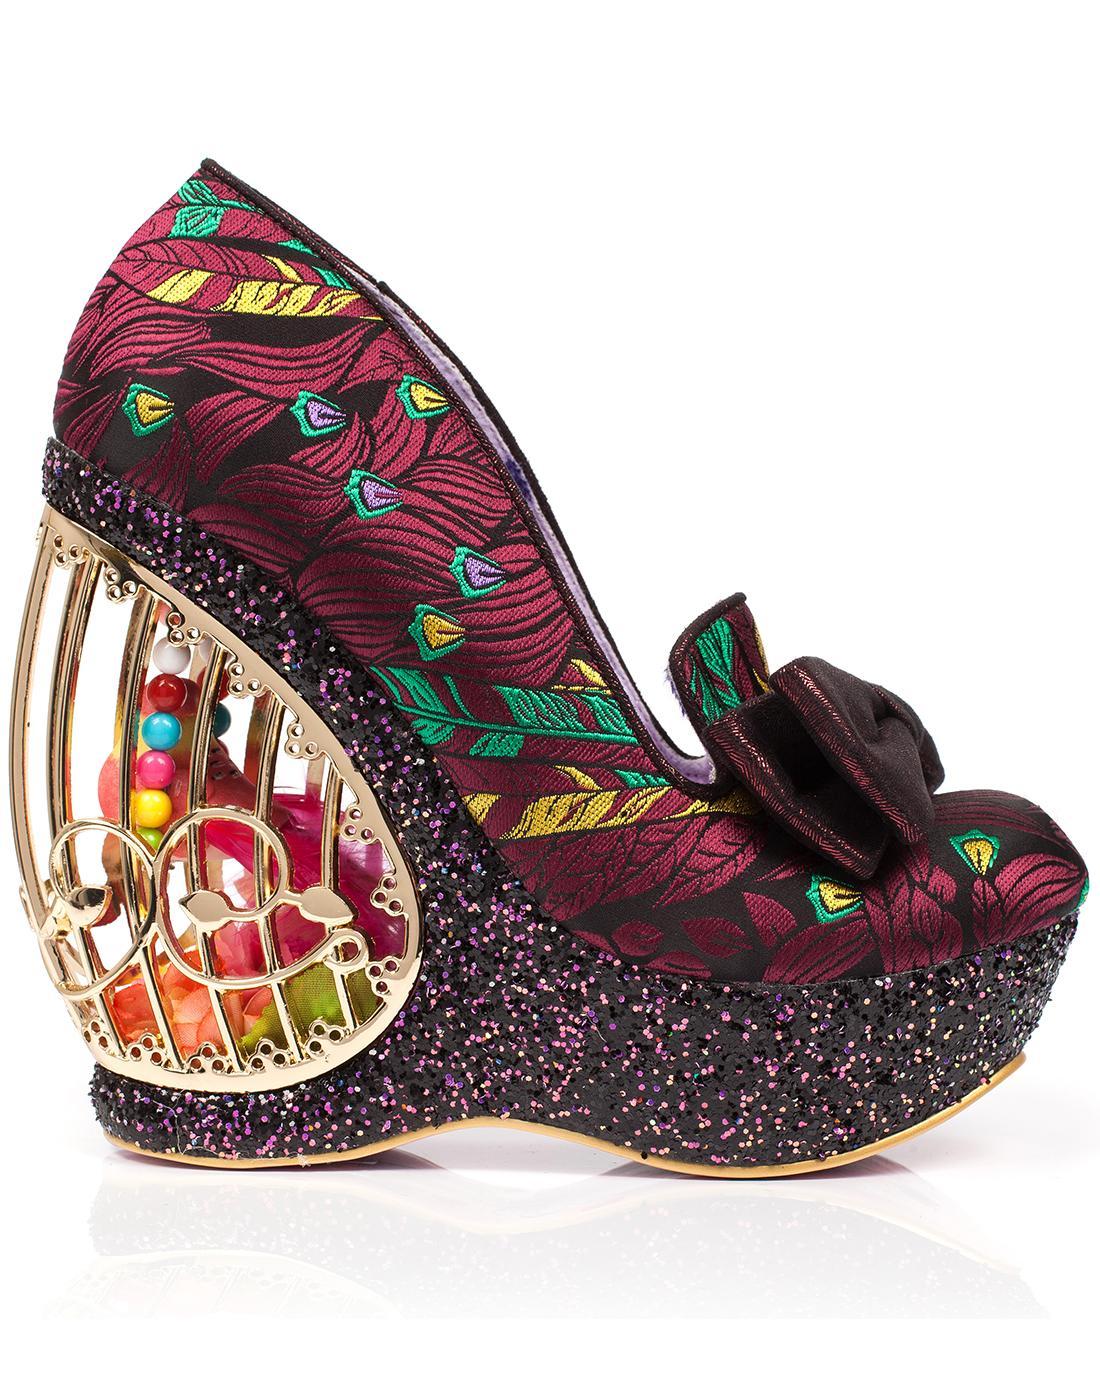 Ornate Agador IRREGULAR CHOICE Birdcage Shoes